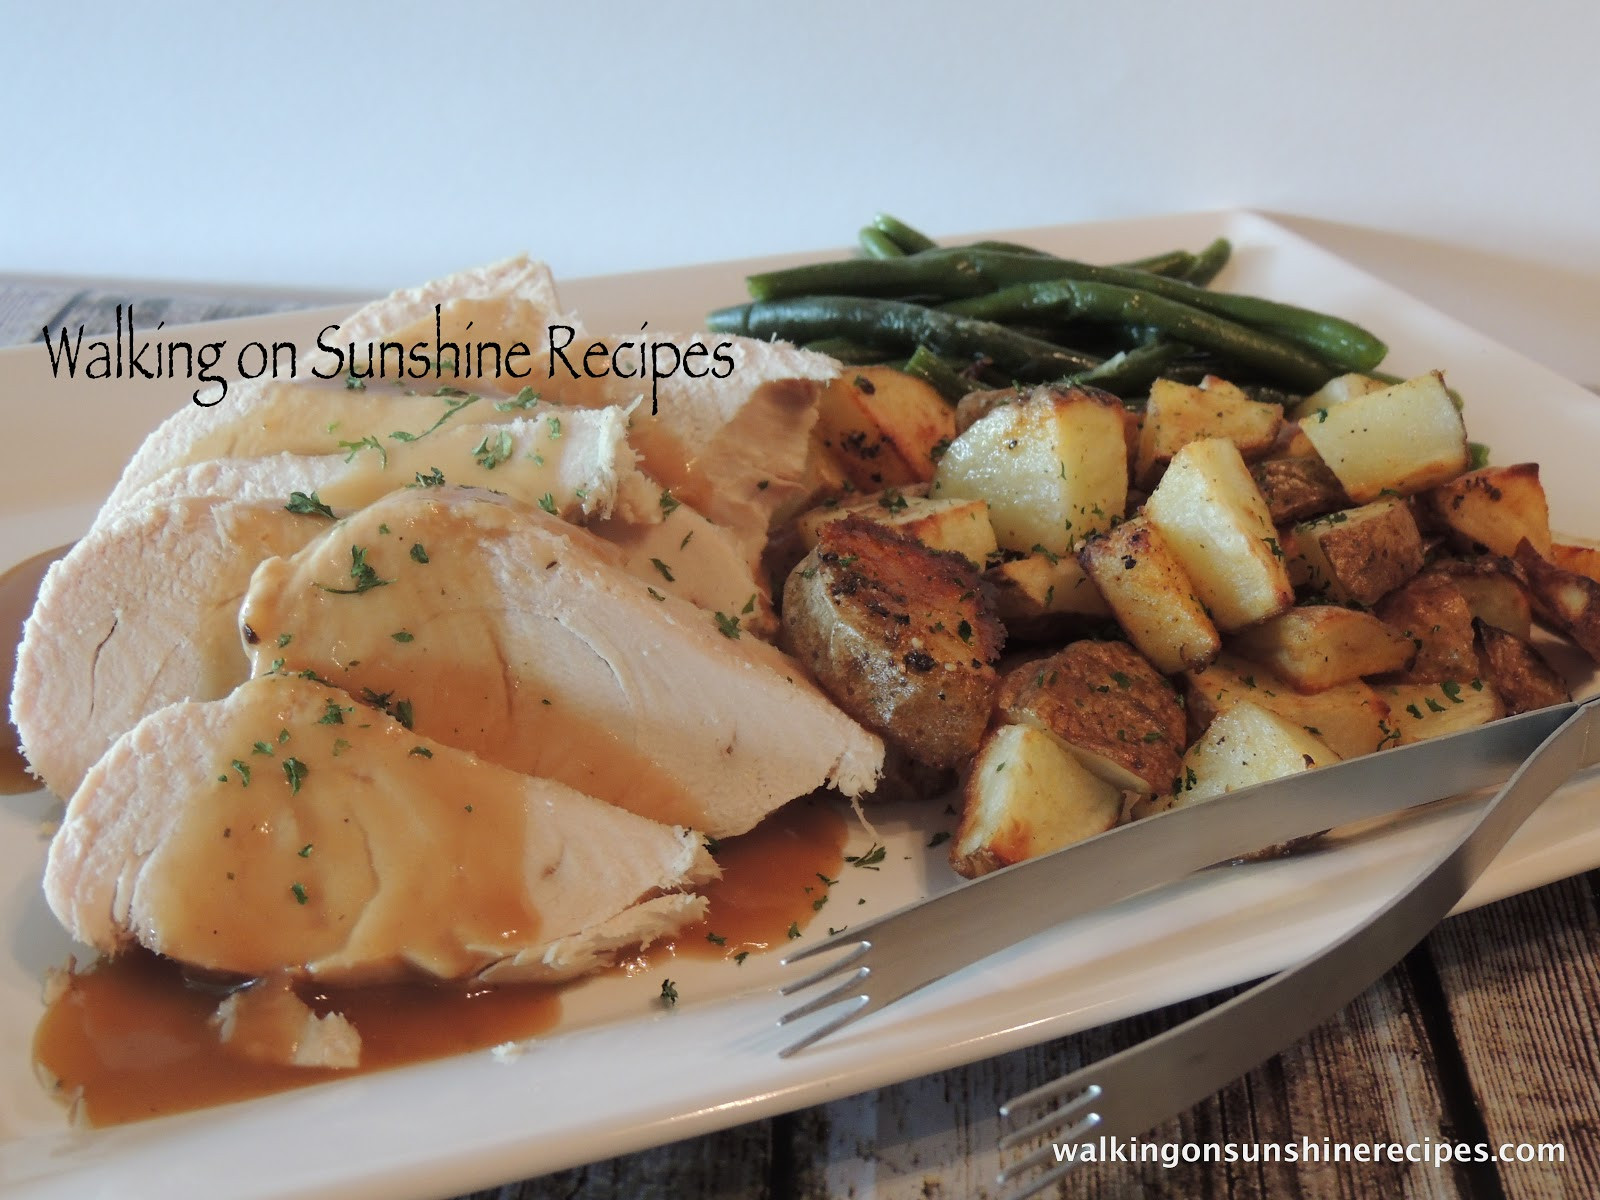 Crock Pot Turkey Recipes For Thanksgiving  Roast Turkey in the Crock Pot Walking on Sunshine